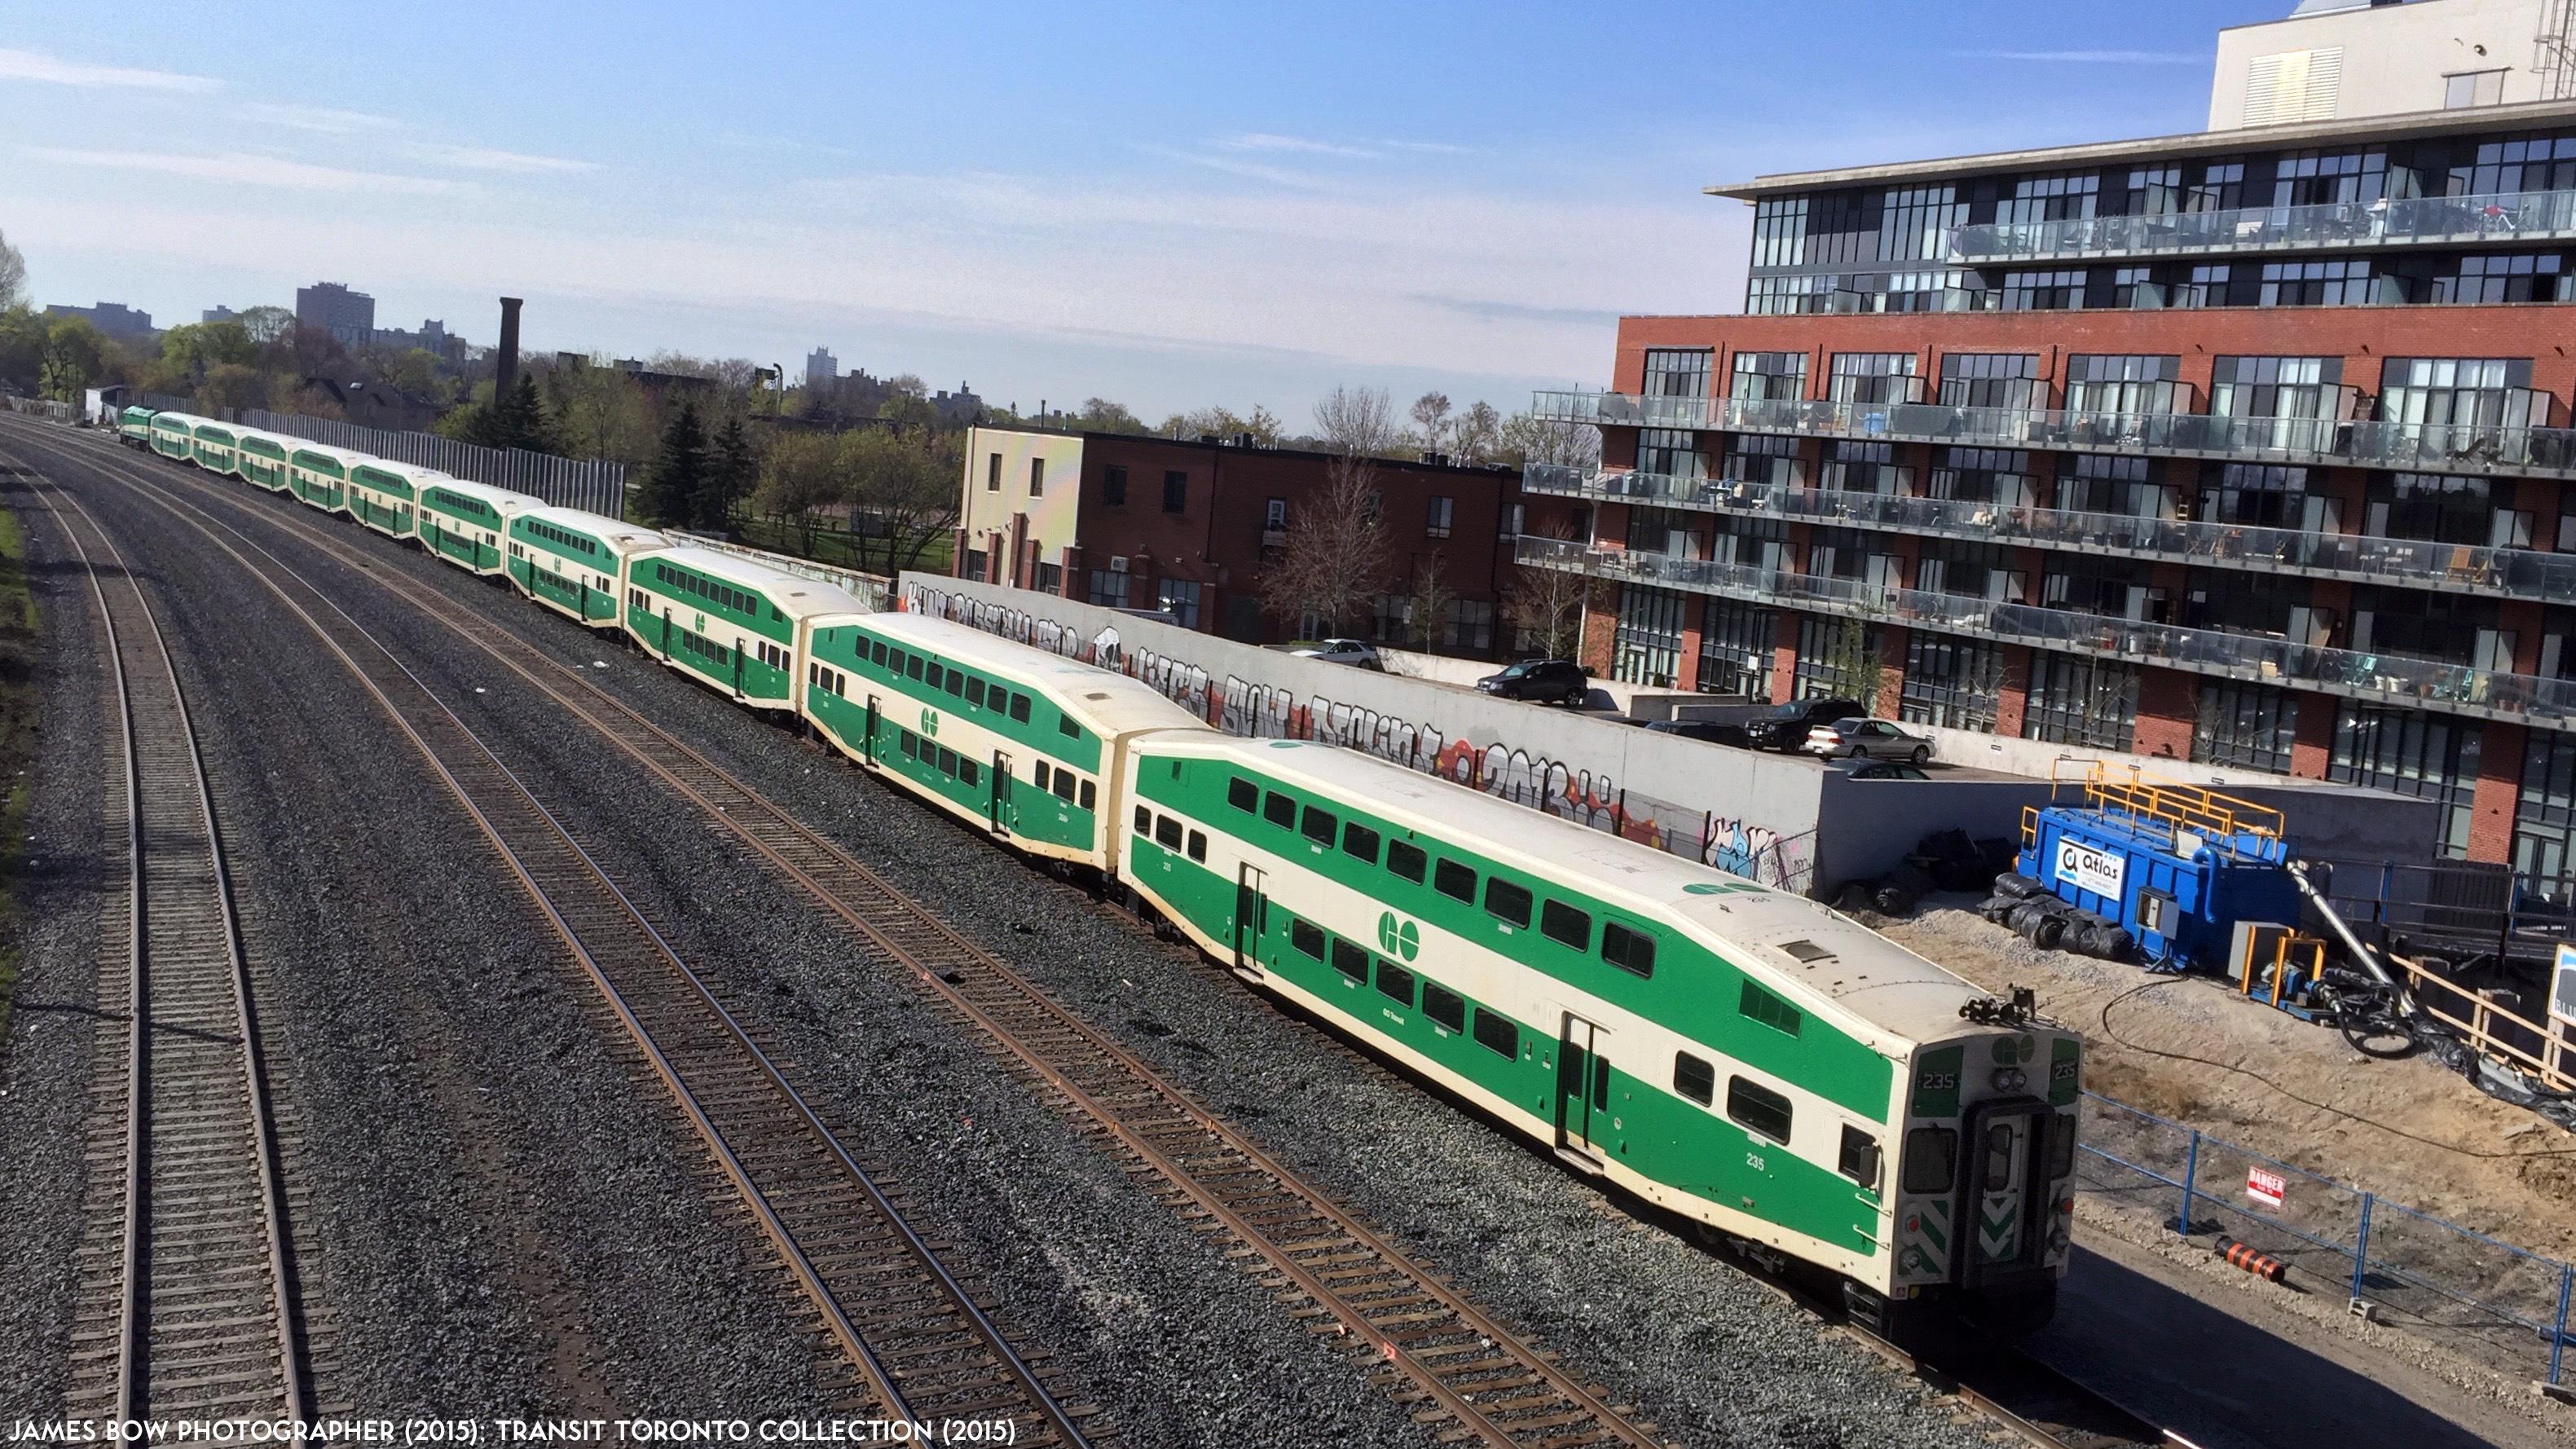 Via Train To Kitchener From Toronto